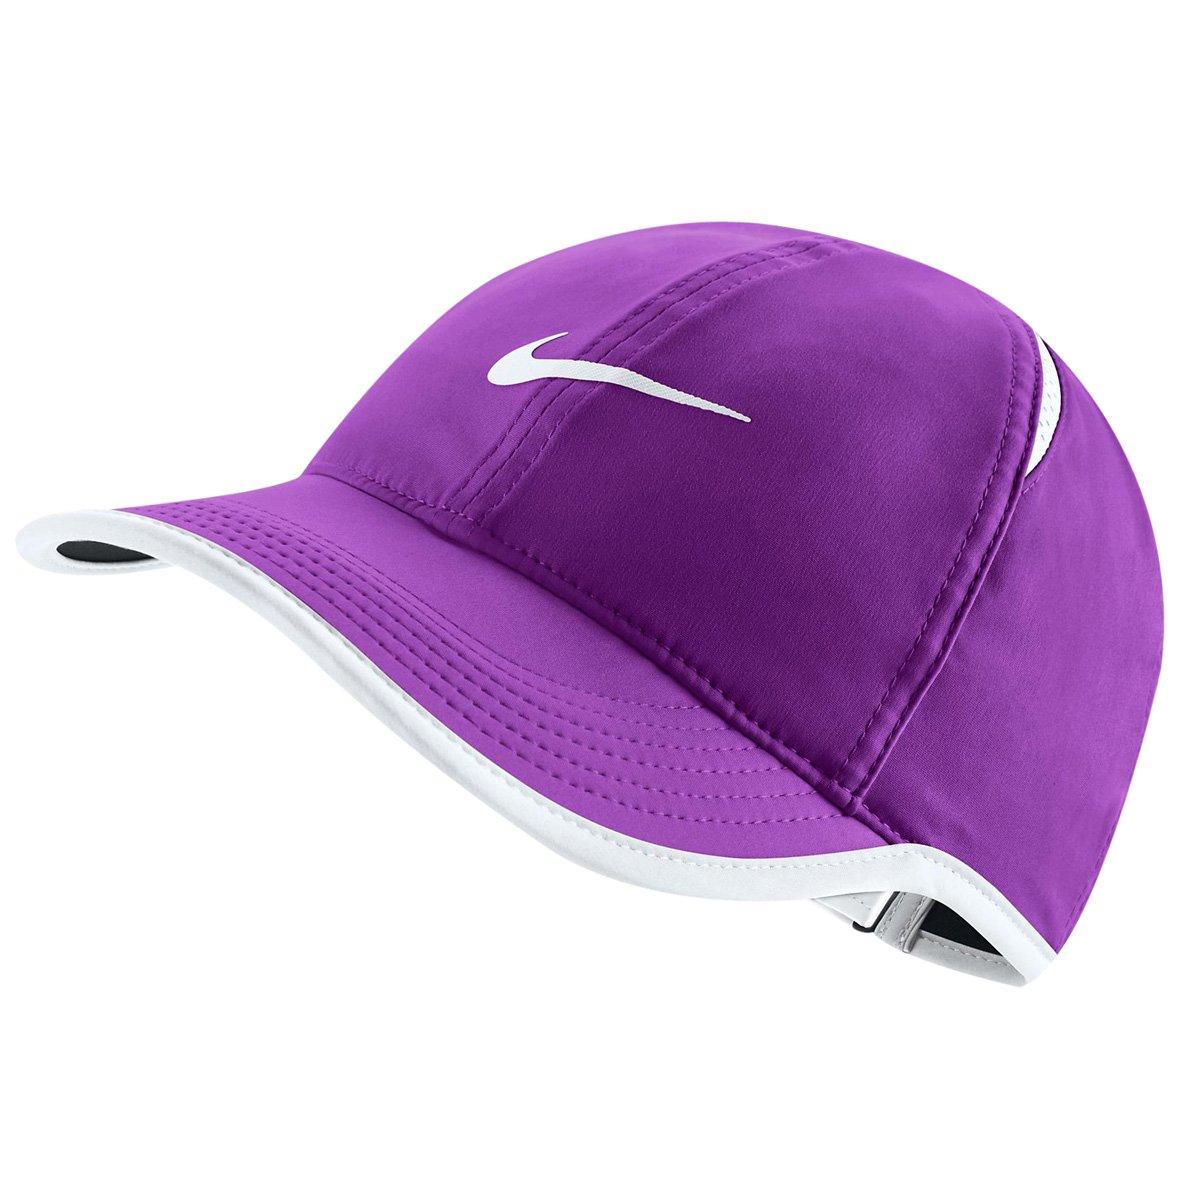 Boné Nike Aerobill Featherlight 879424-585 Lilas 97df1b64abb